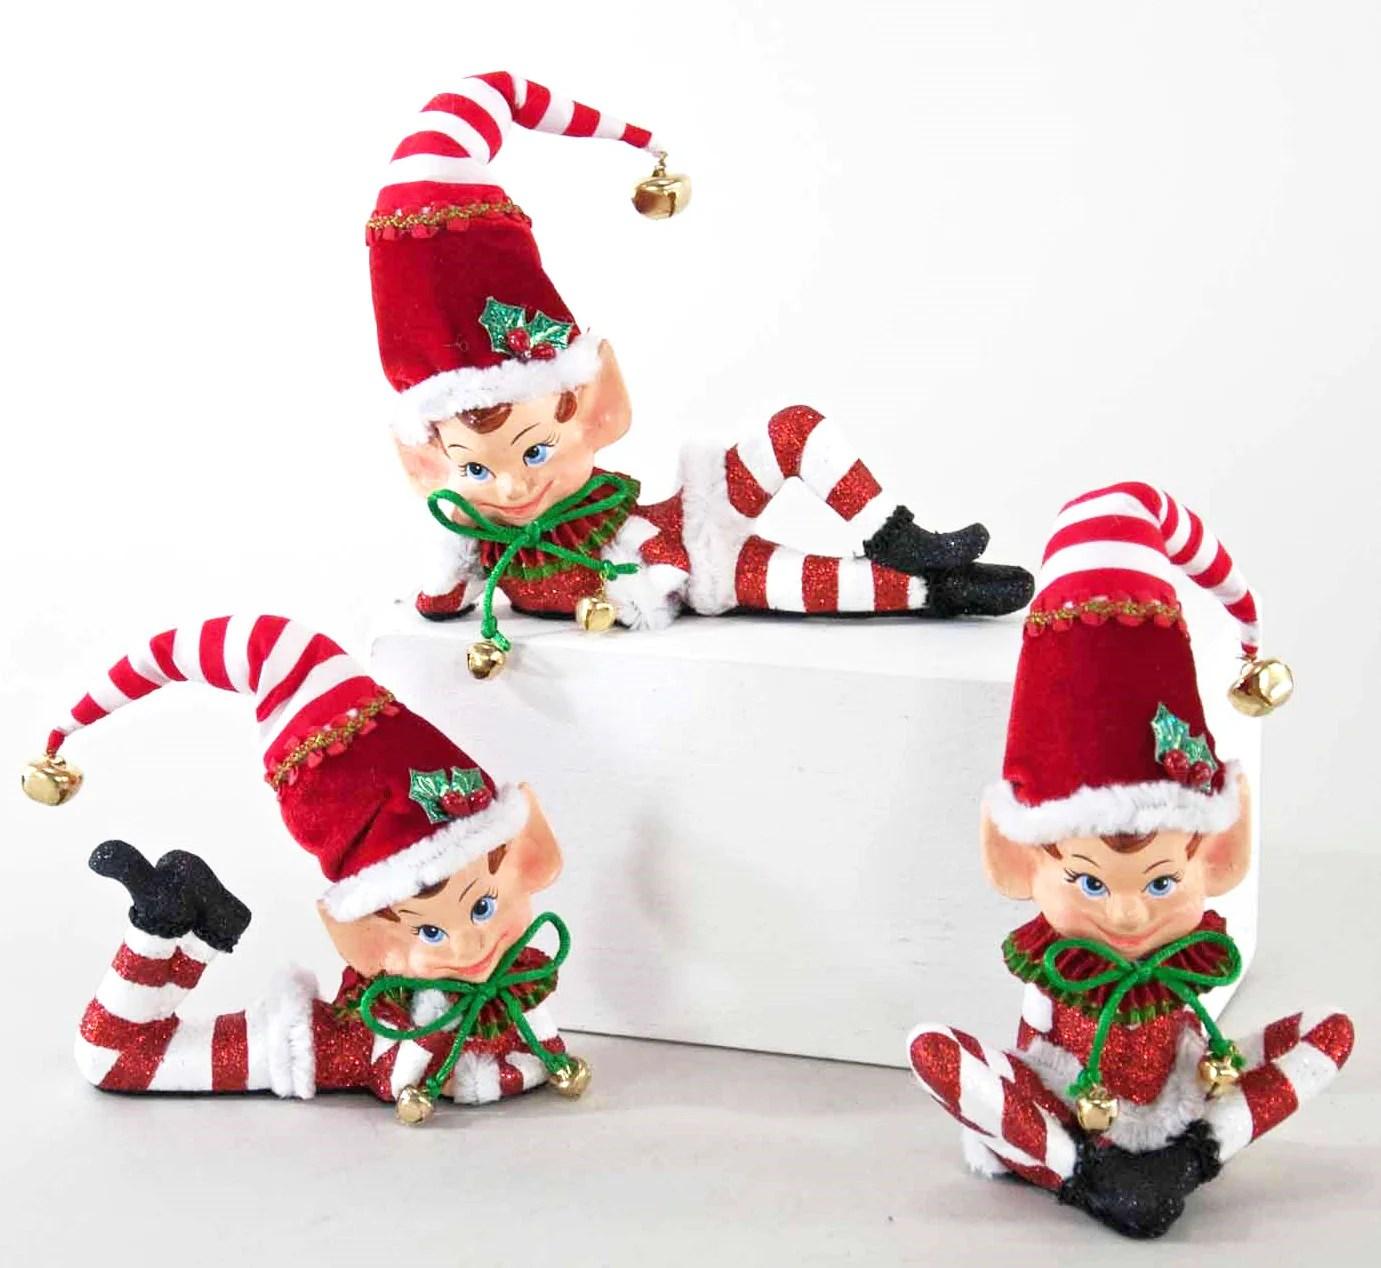 Retro Elf Ornaments With Red And White Stripes Retro Christmas Decor Theholidaybarn Com